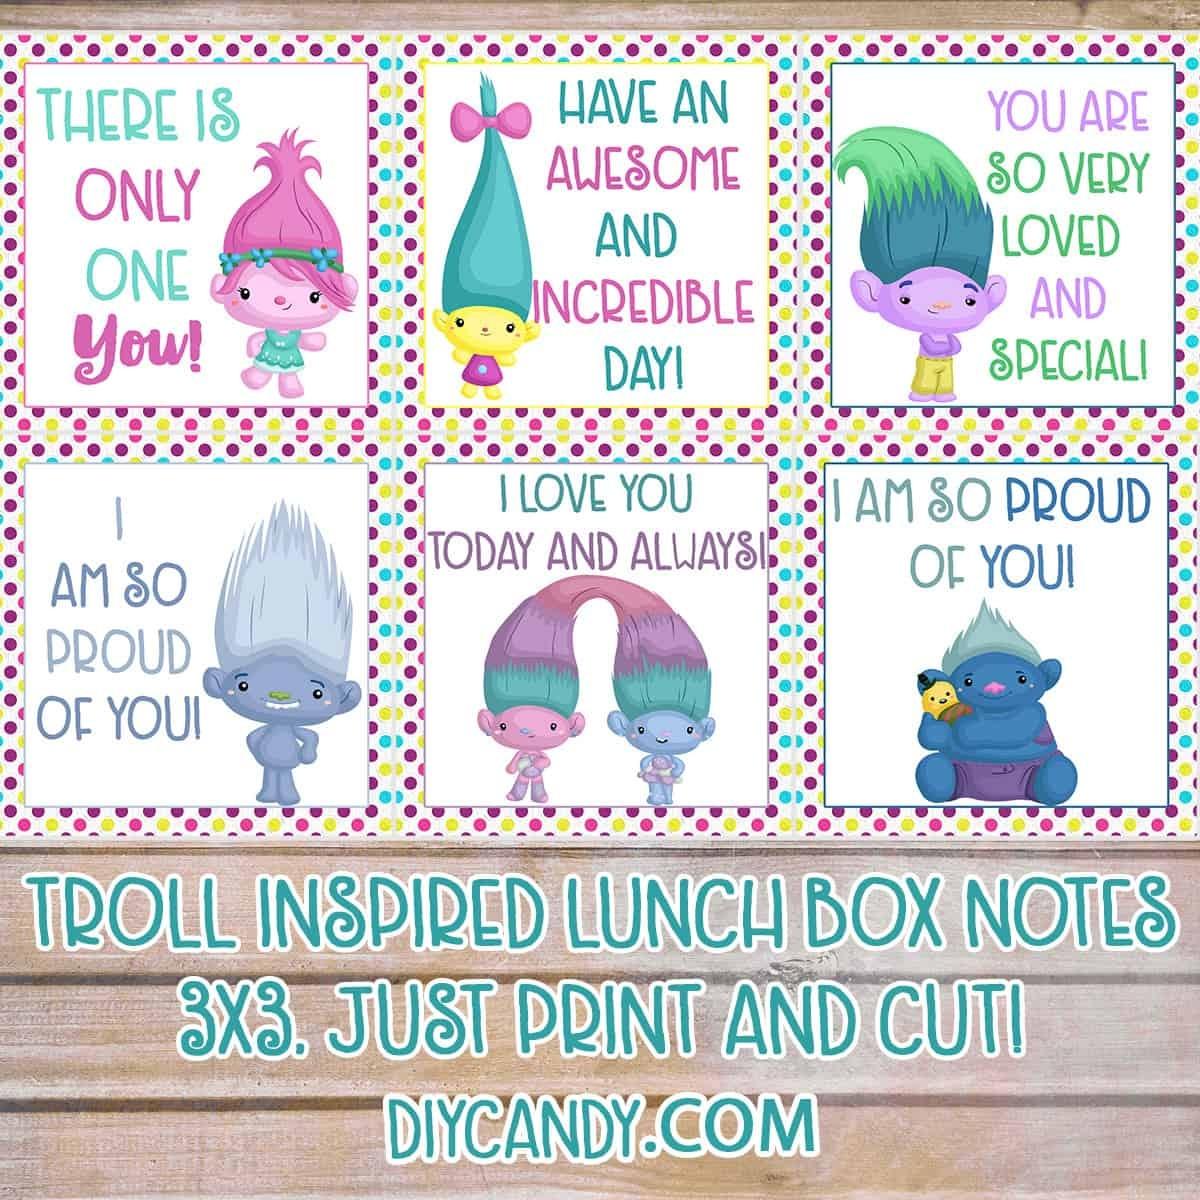 Free Trolls Printables: Lunchbox Notes - Diy Candy - Free Trolls Printables